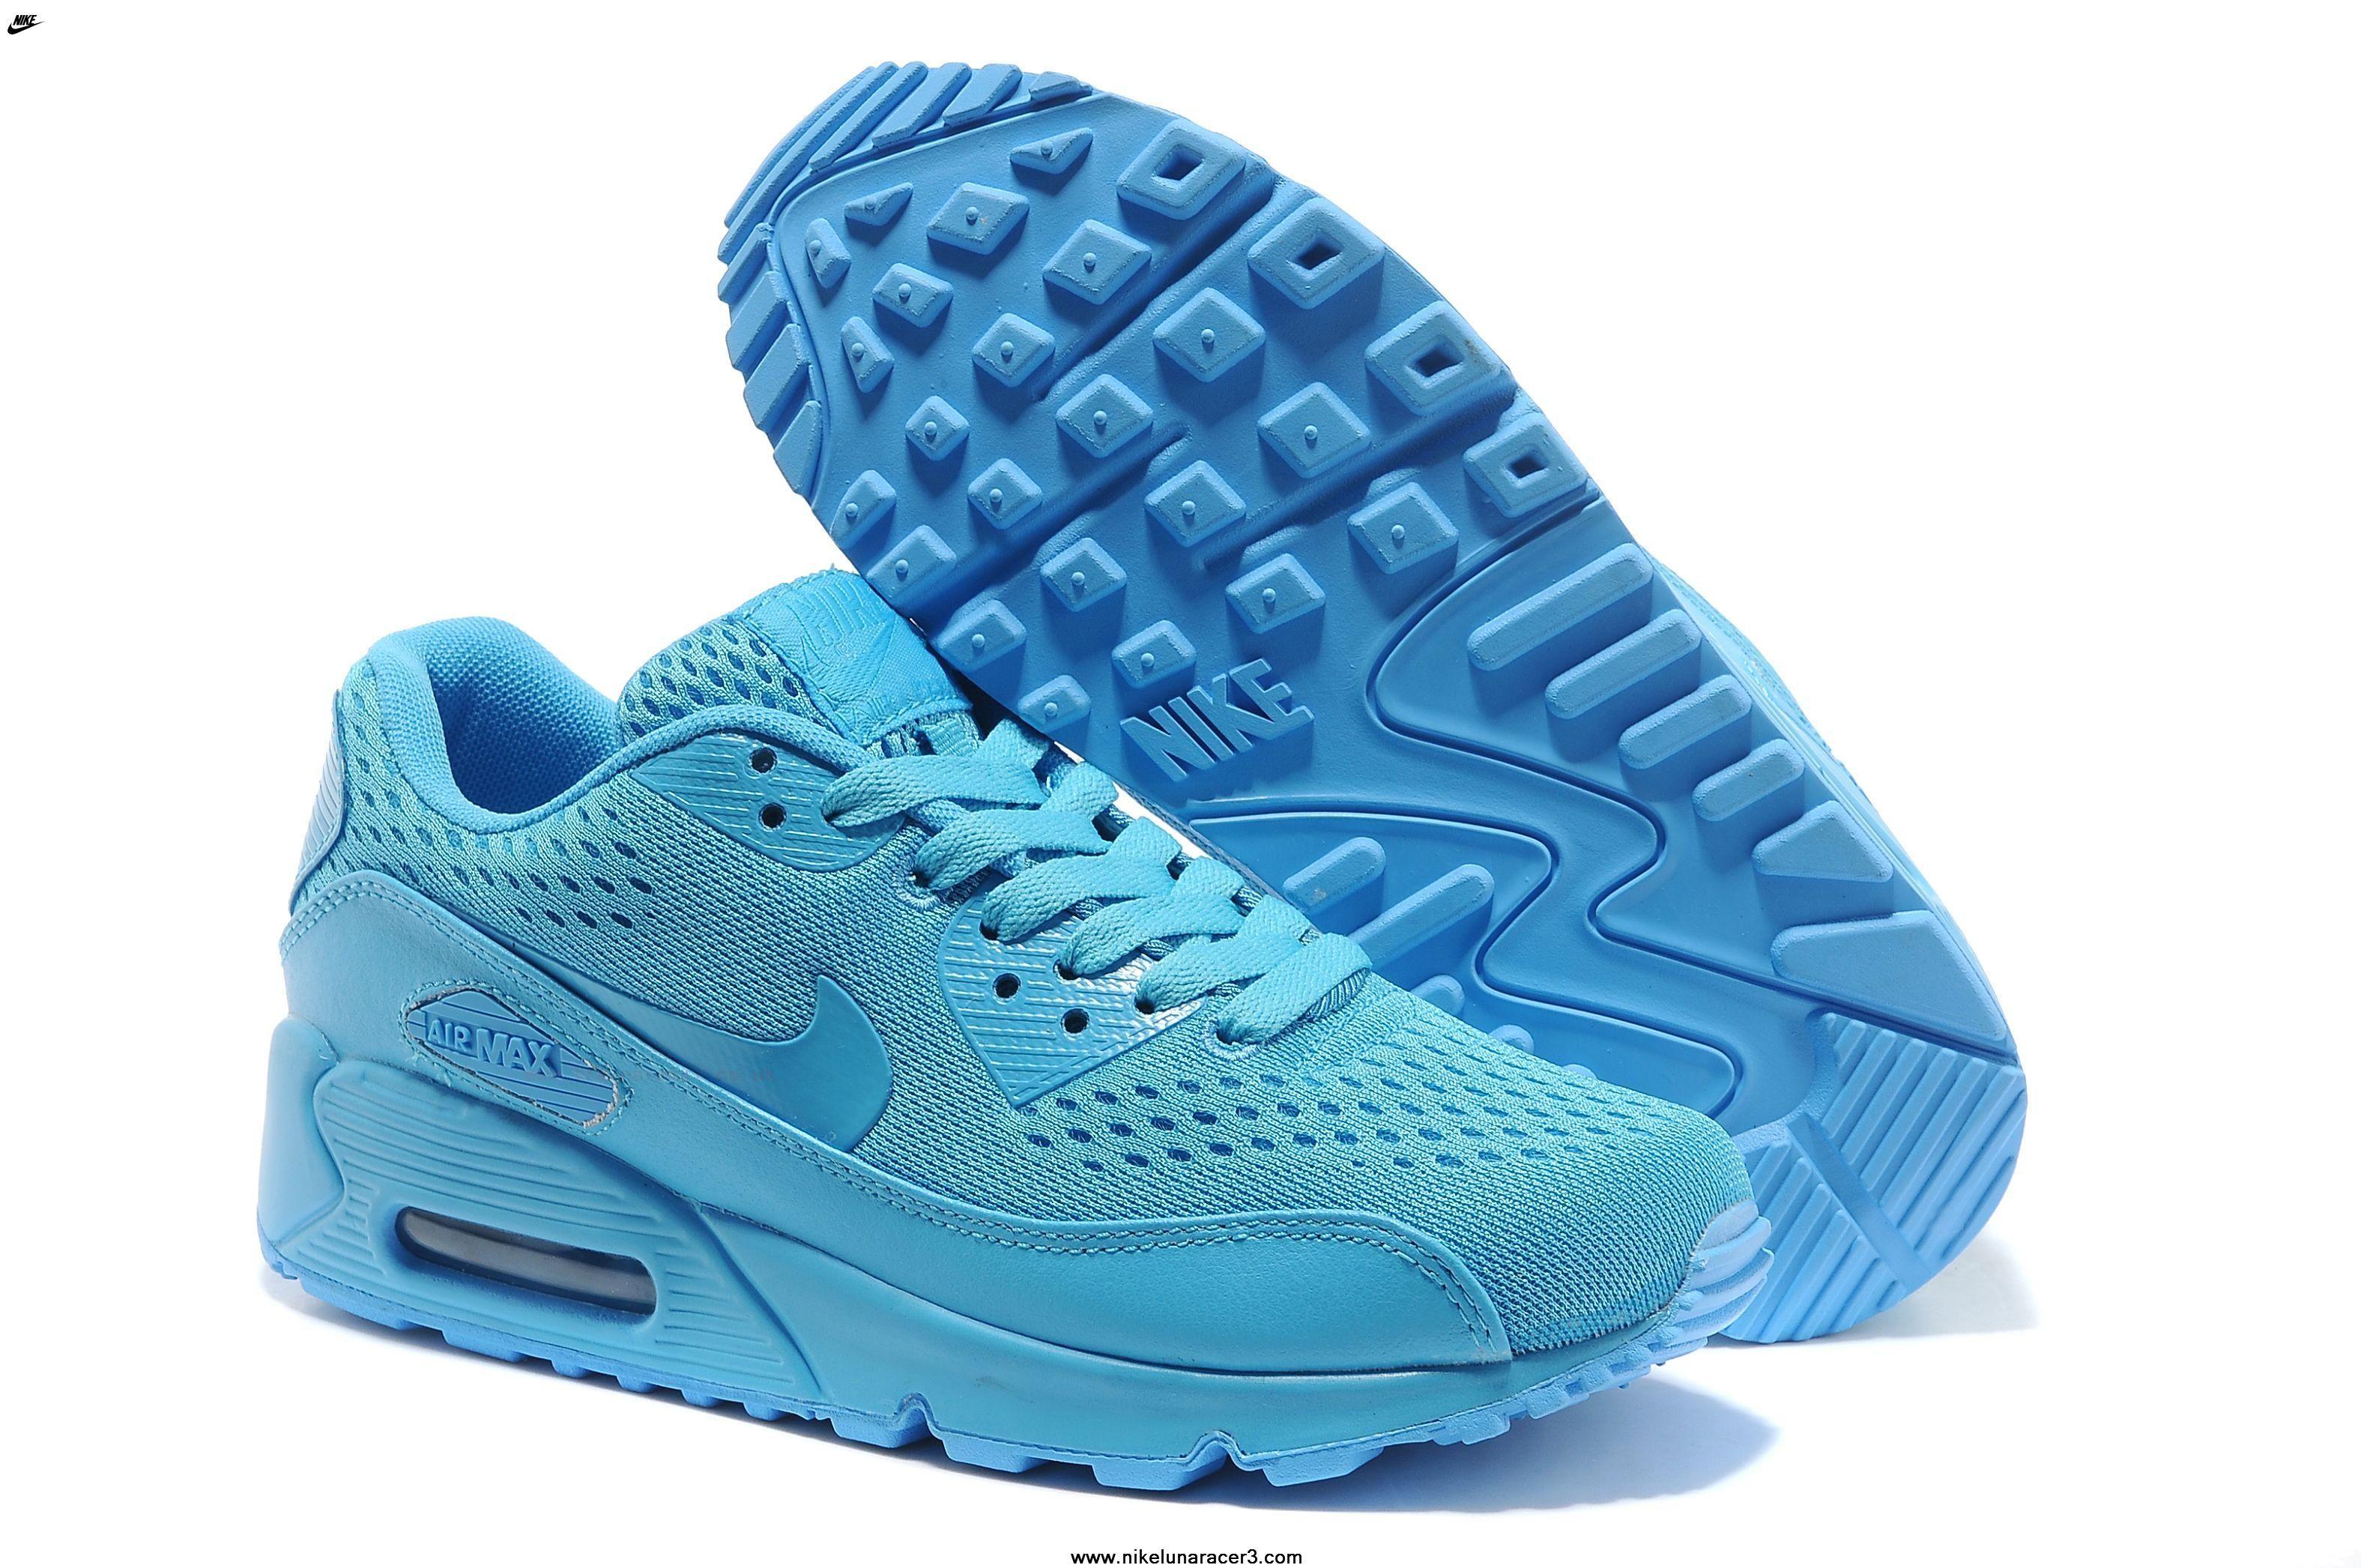 Air Max 90 Premium EM Mens Shoes 2014 Release Blue